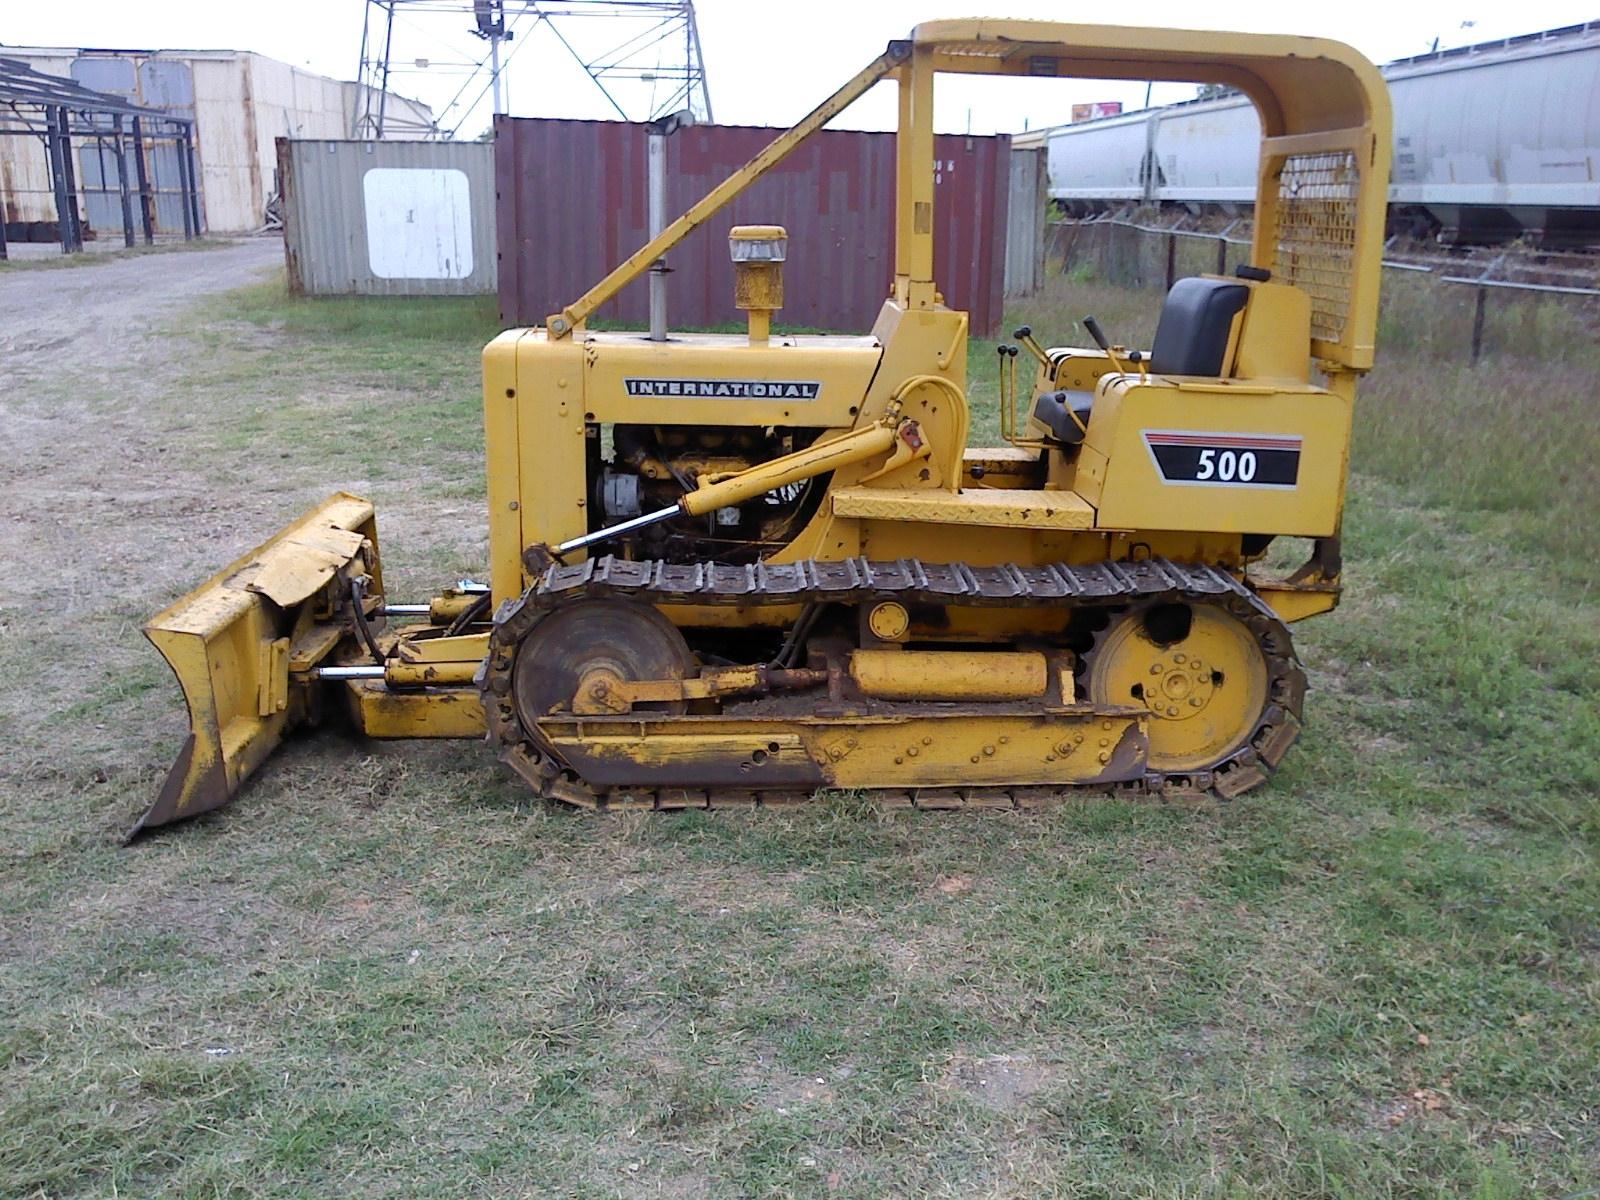 Image Ih 500e Dozer Purchased 11 2011 Jpg Tractor Amp Construction Plant Wiki Fandom Powered